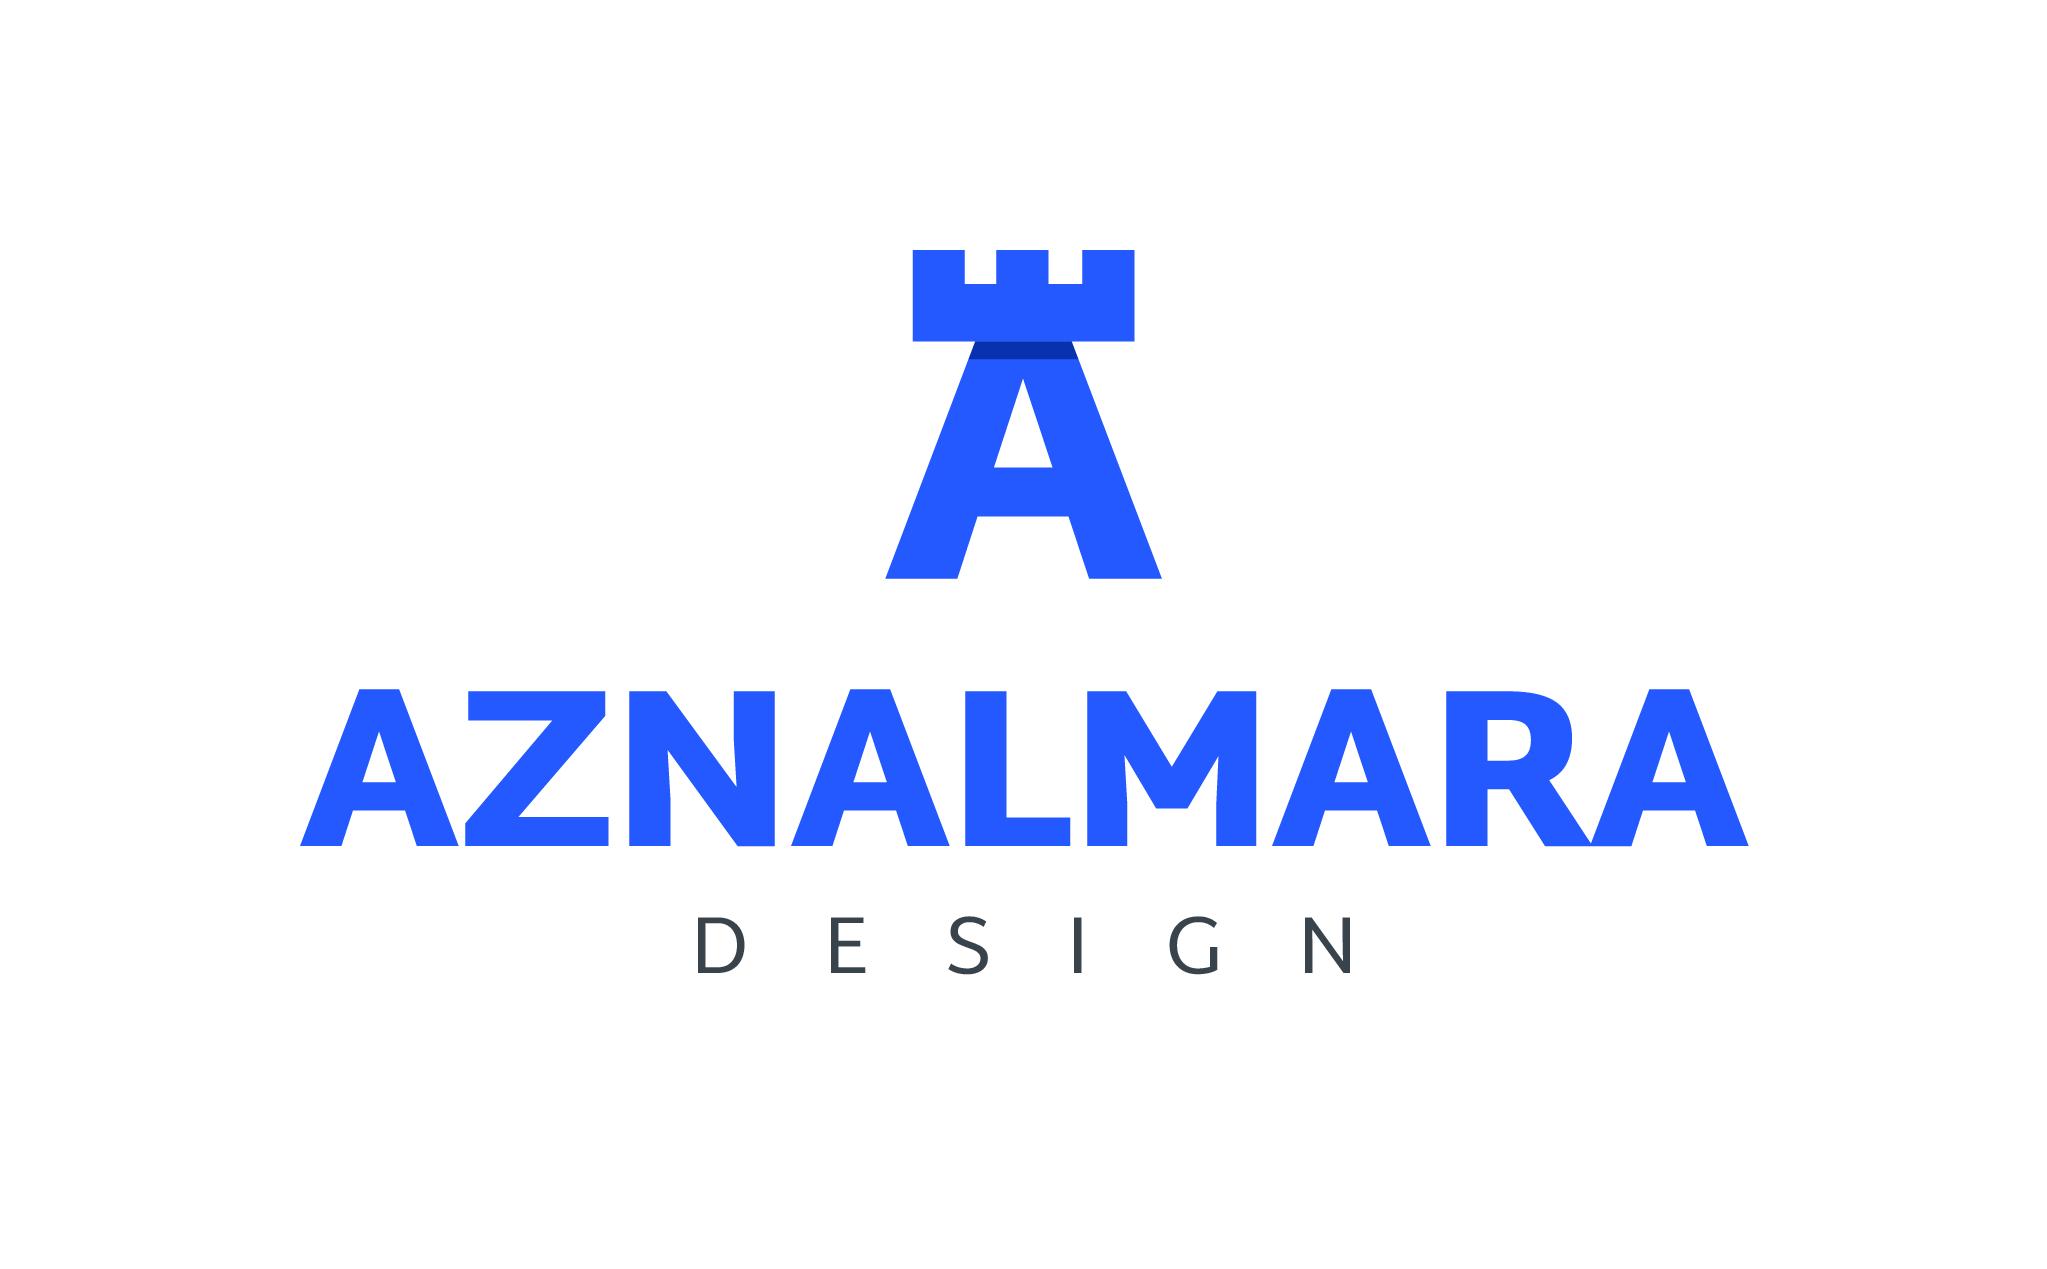 LOGO_VERTICAL_AZNALMARA®_DESIGN_AZUL_FONDO_BLANCO